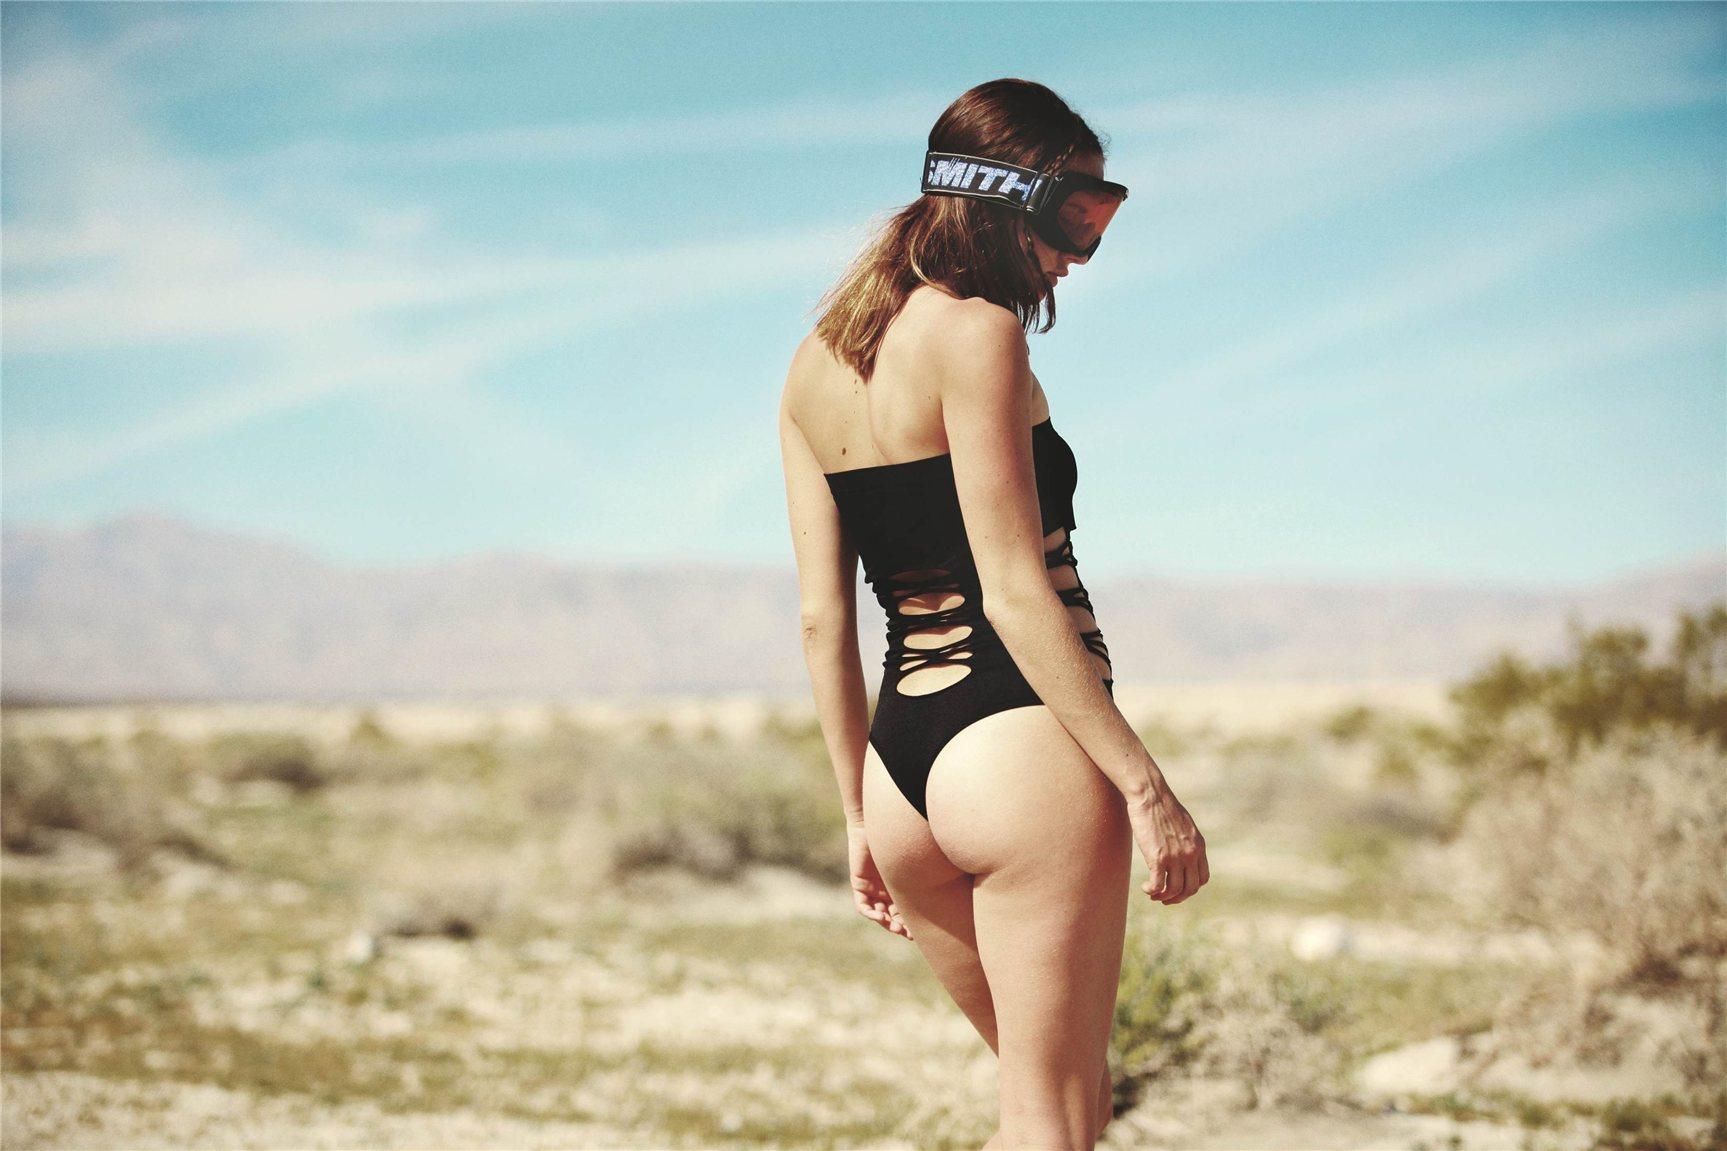 Olivia North nude by James Minics - Nif Magazine